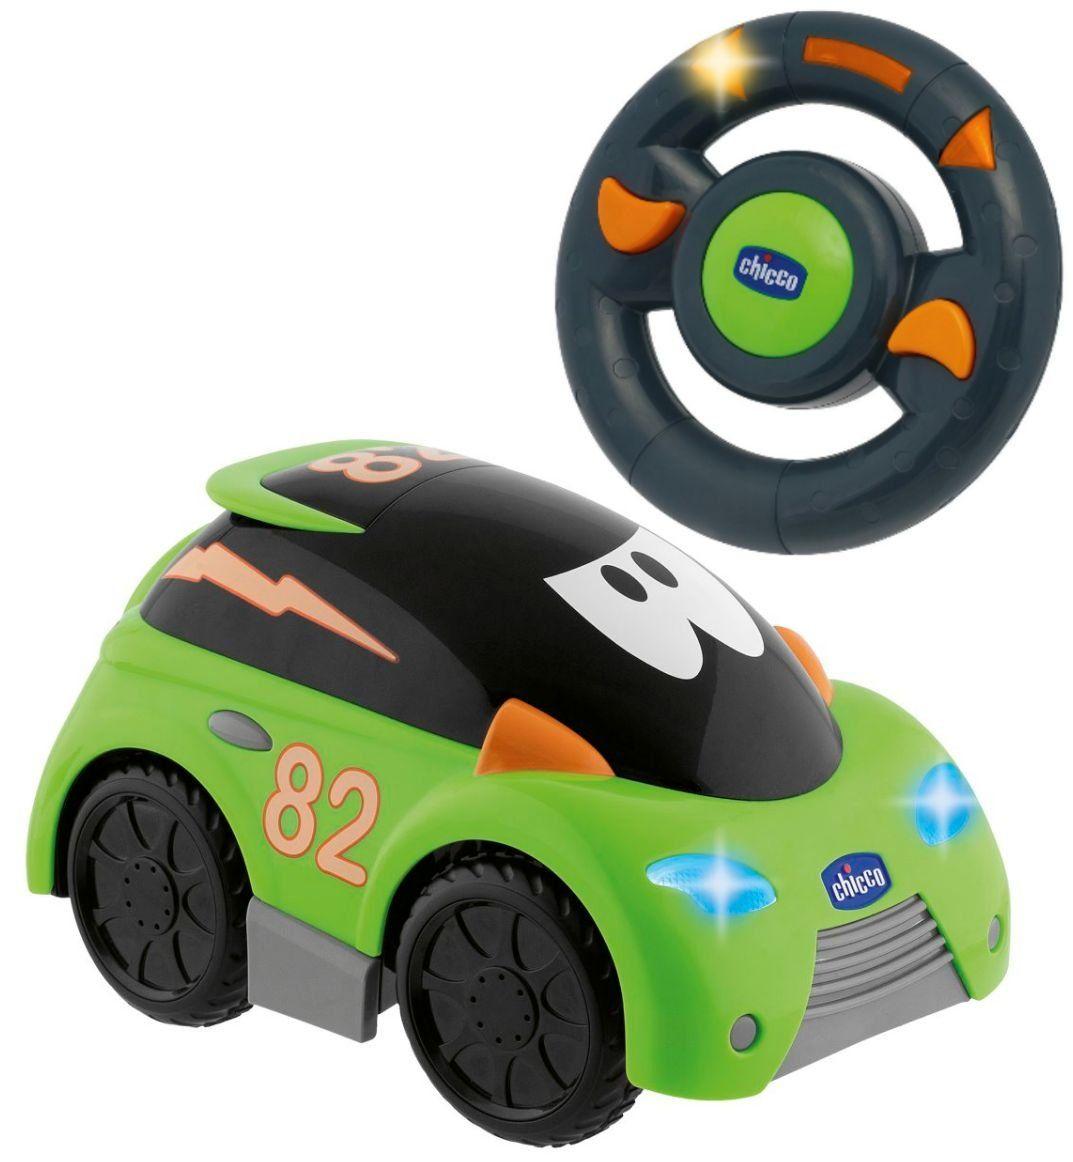 Chicco jimmy thunders radio controlled car radio control